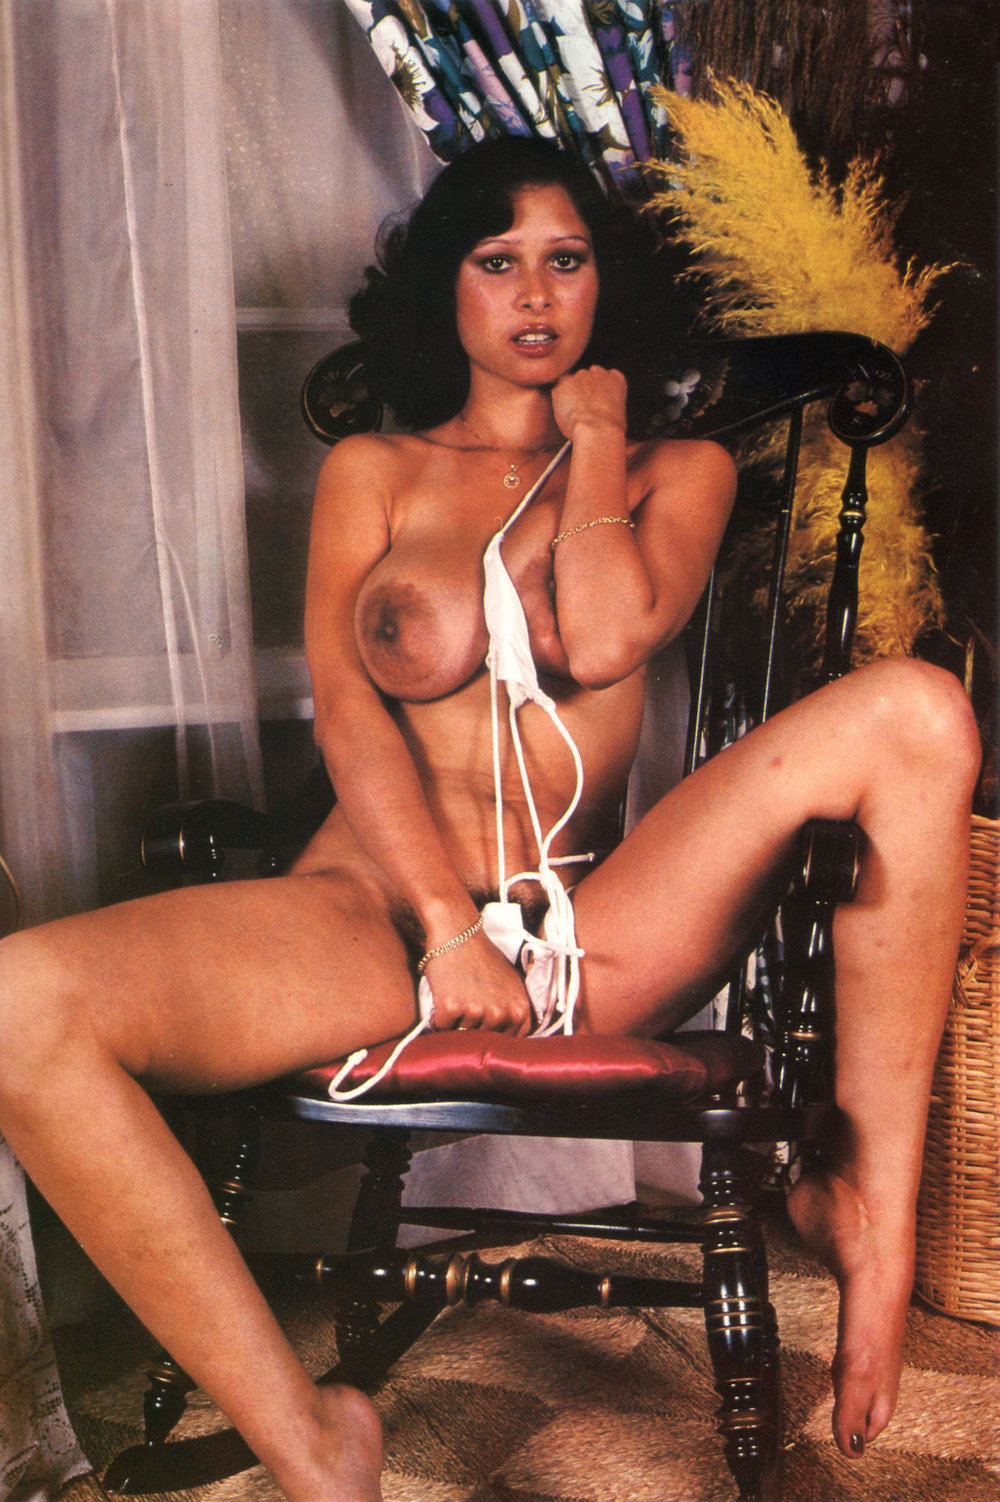 03 Rosemary Lorenz Sex World MAgazine - Ballons 6 .jpg